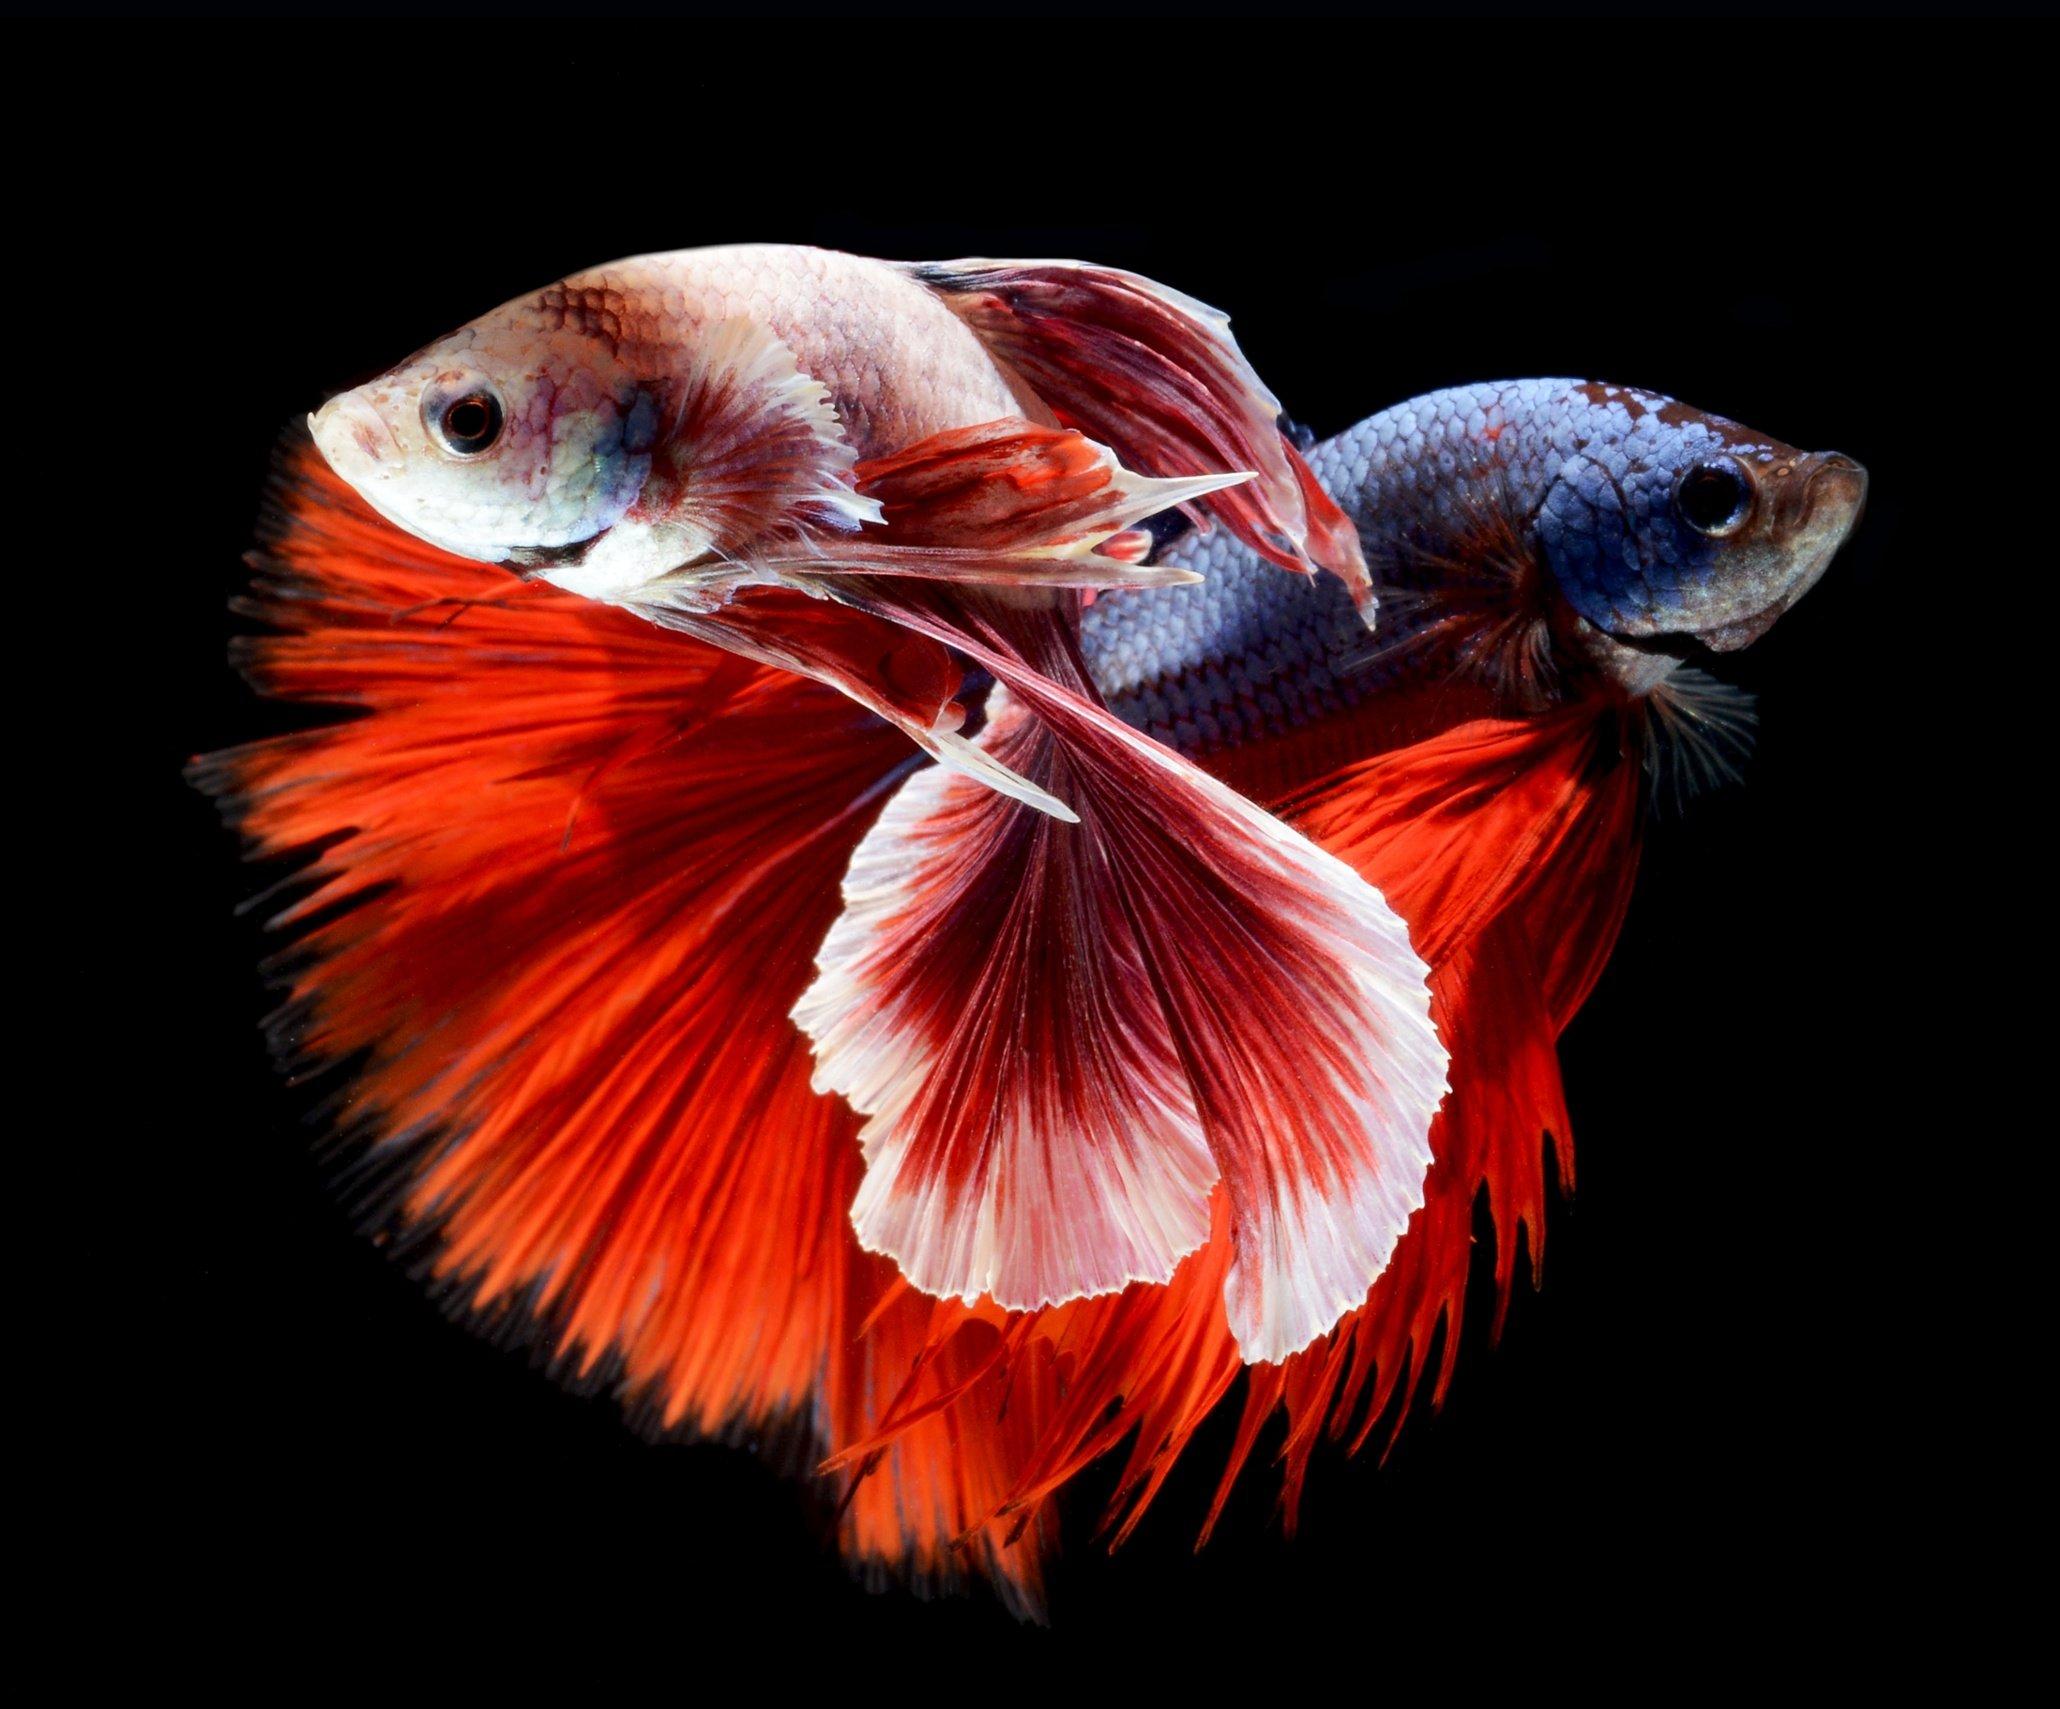 Betta siamese fighting fish colorful tropical wallpaper for Betta fighting fish